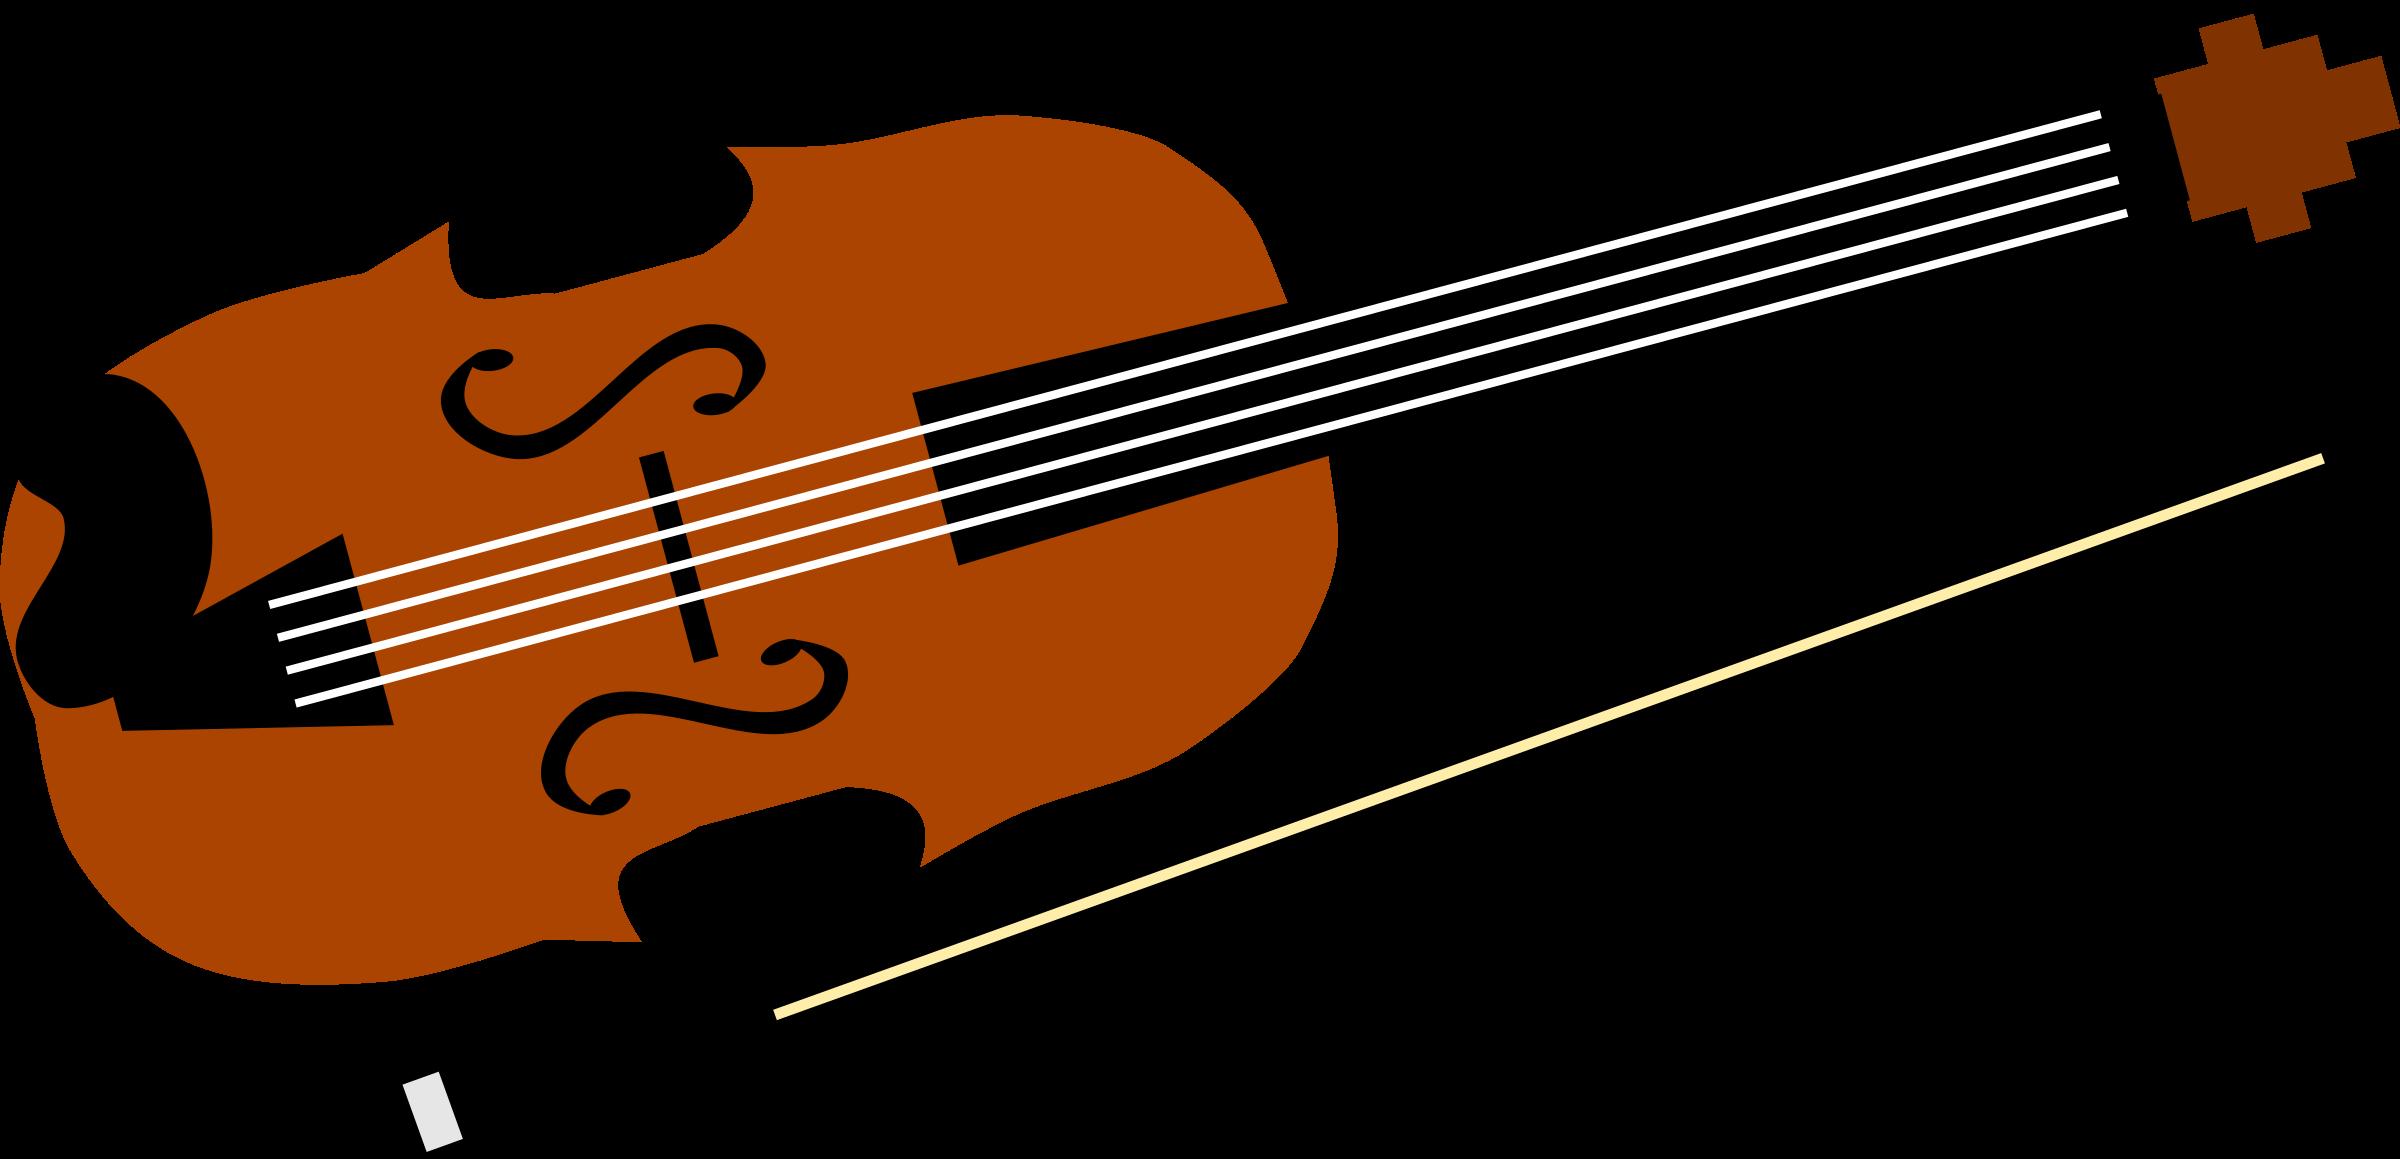 Violin big image png. Clipart music orchestra